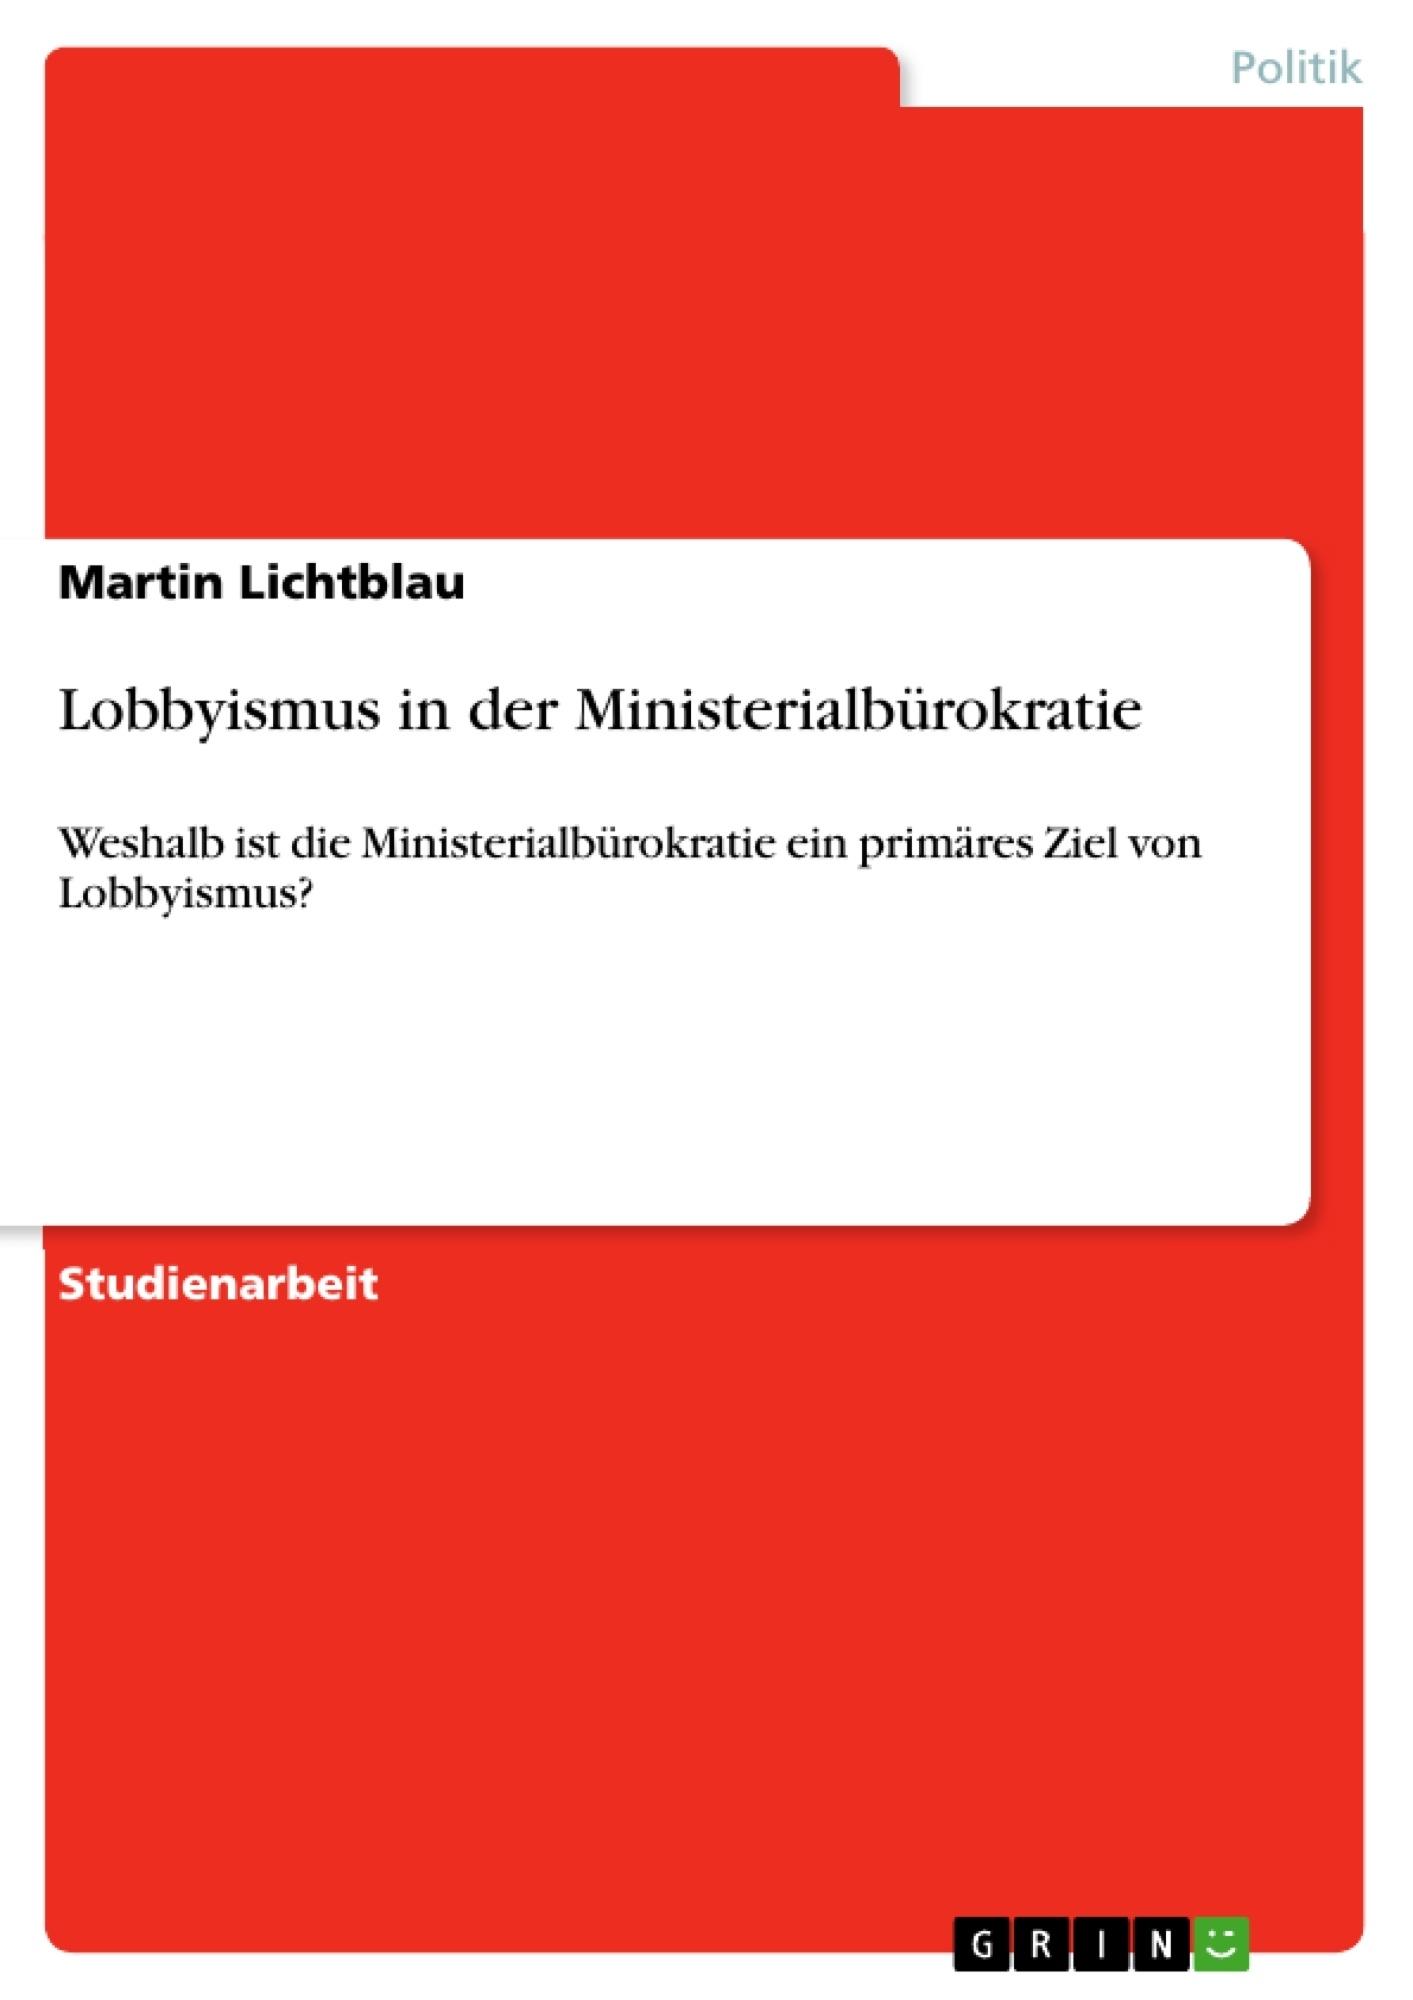 Titel: Lobbyismus in der Ministerialbürokratie